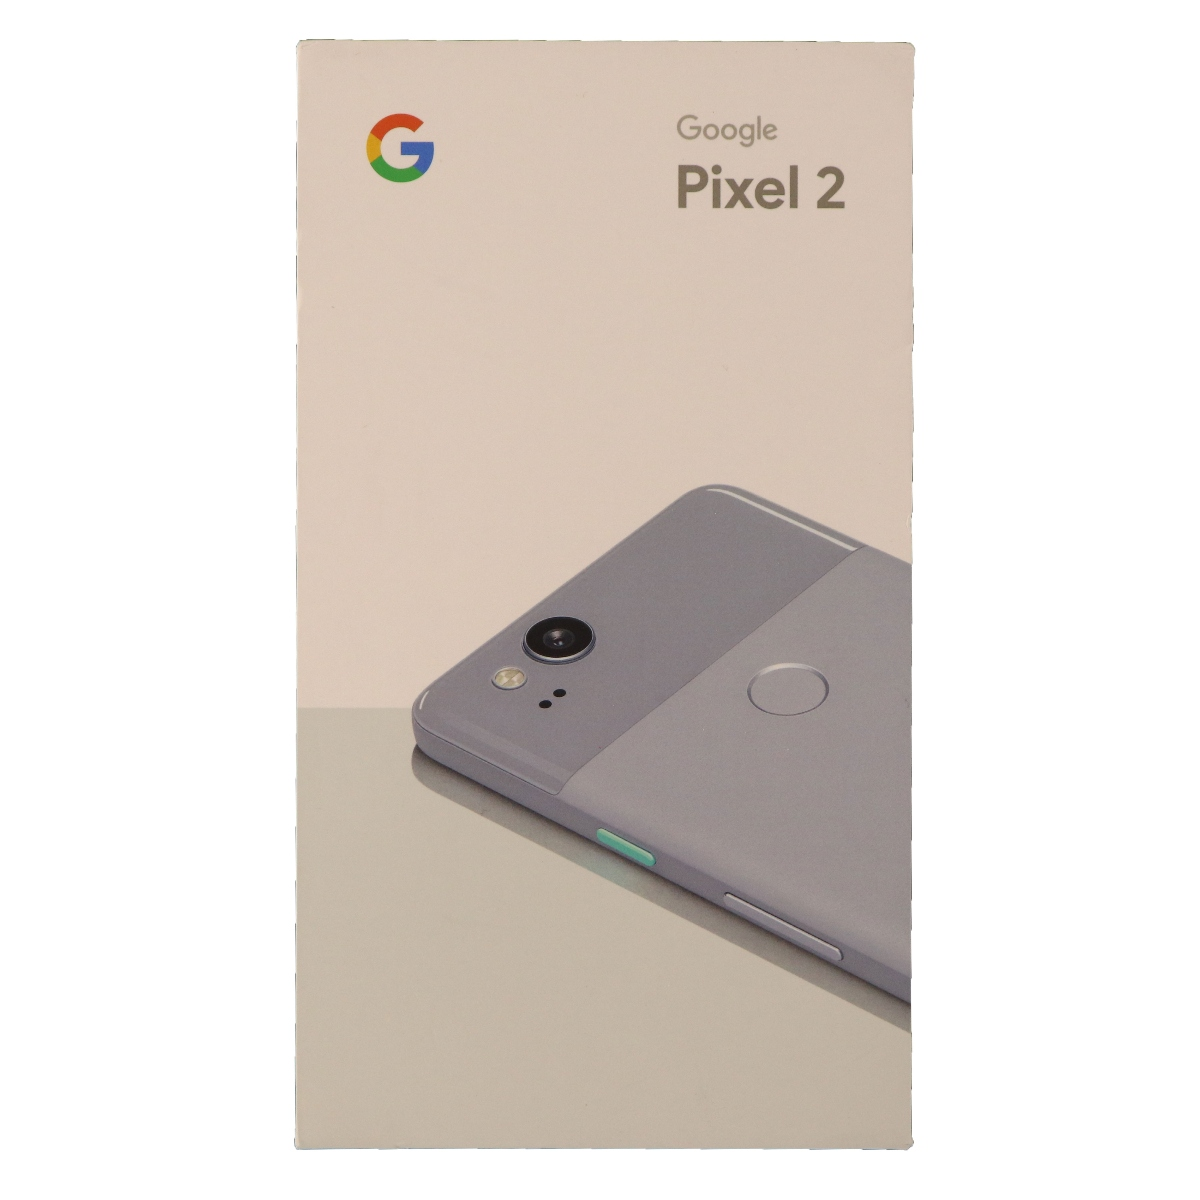 Google Pixel 2 Empty Box Only NO Phone NO Manual Kinda Blue